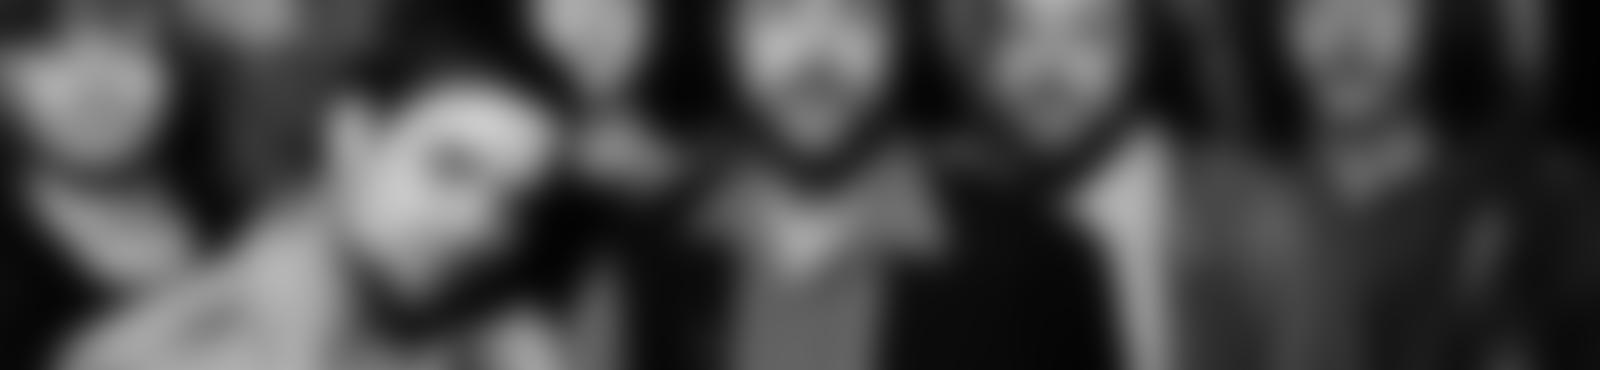 Blurred cab8deb6 81a4 486e b8f4 df0acc10b940